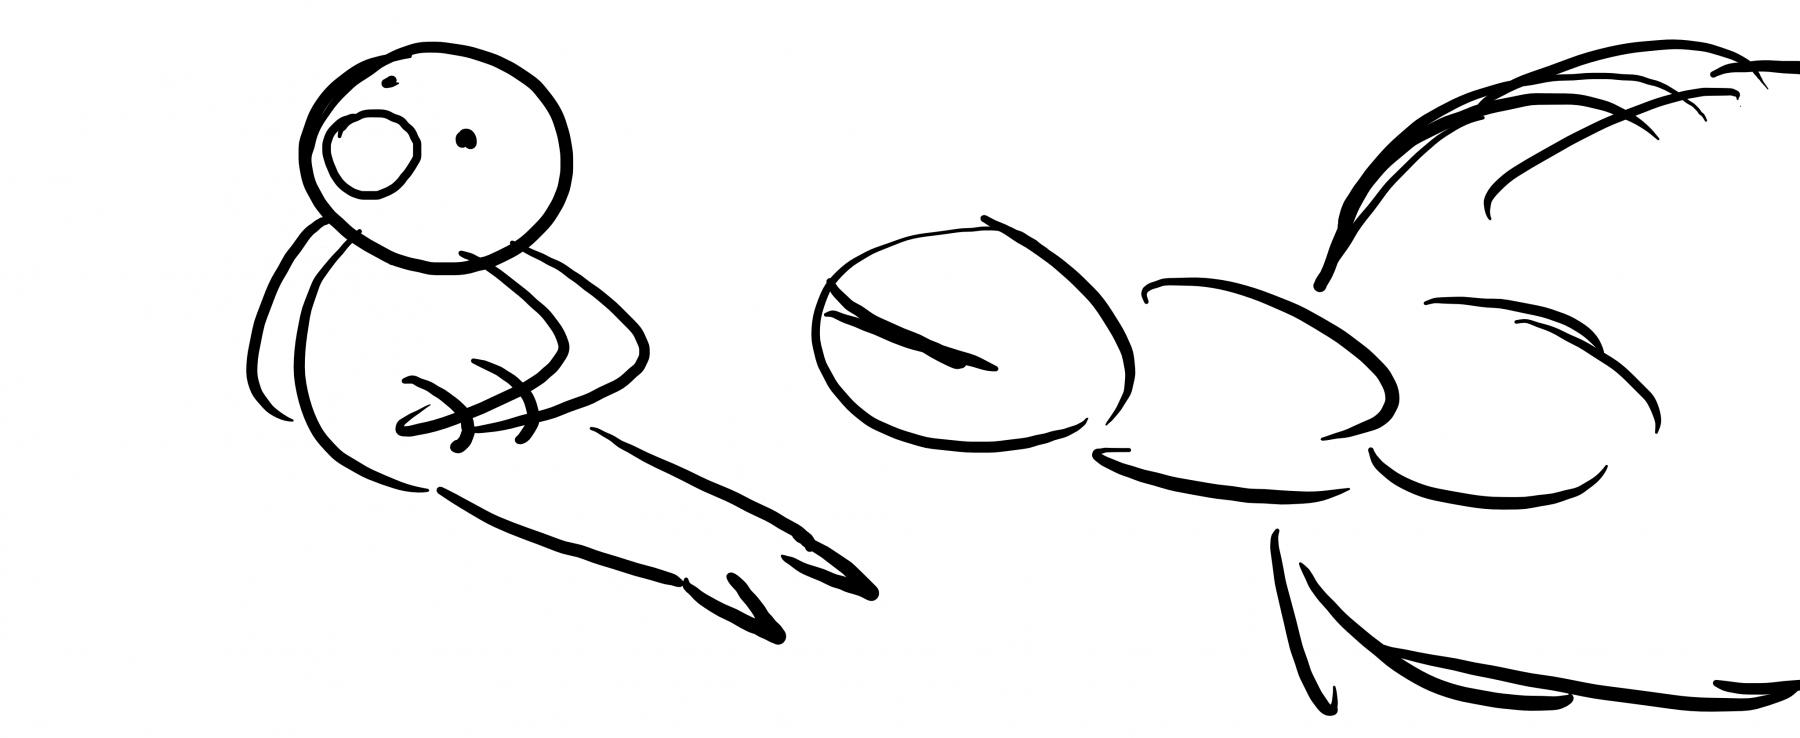 Nut-Thumbnail-Rough-Board00296